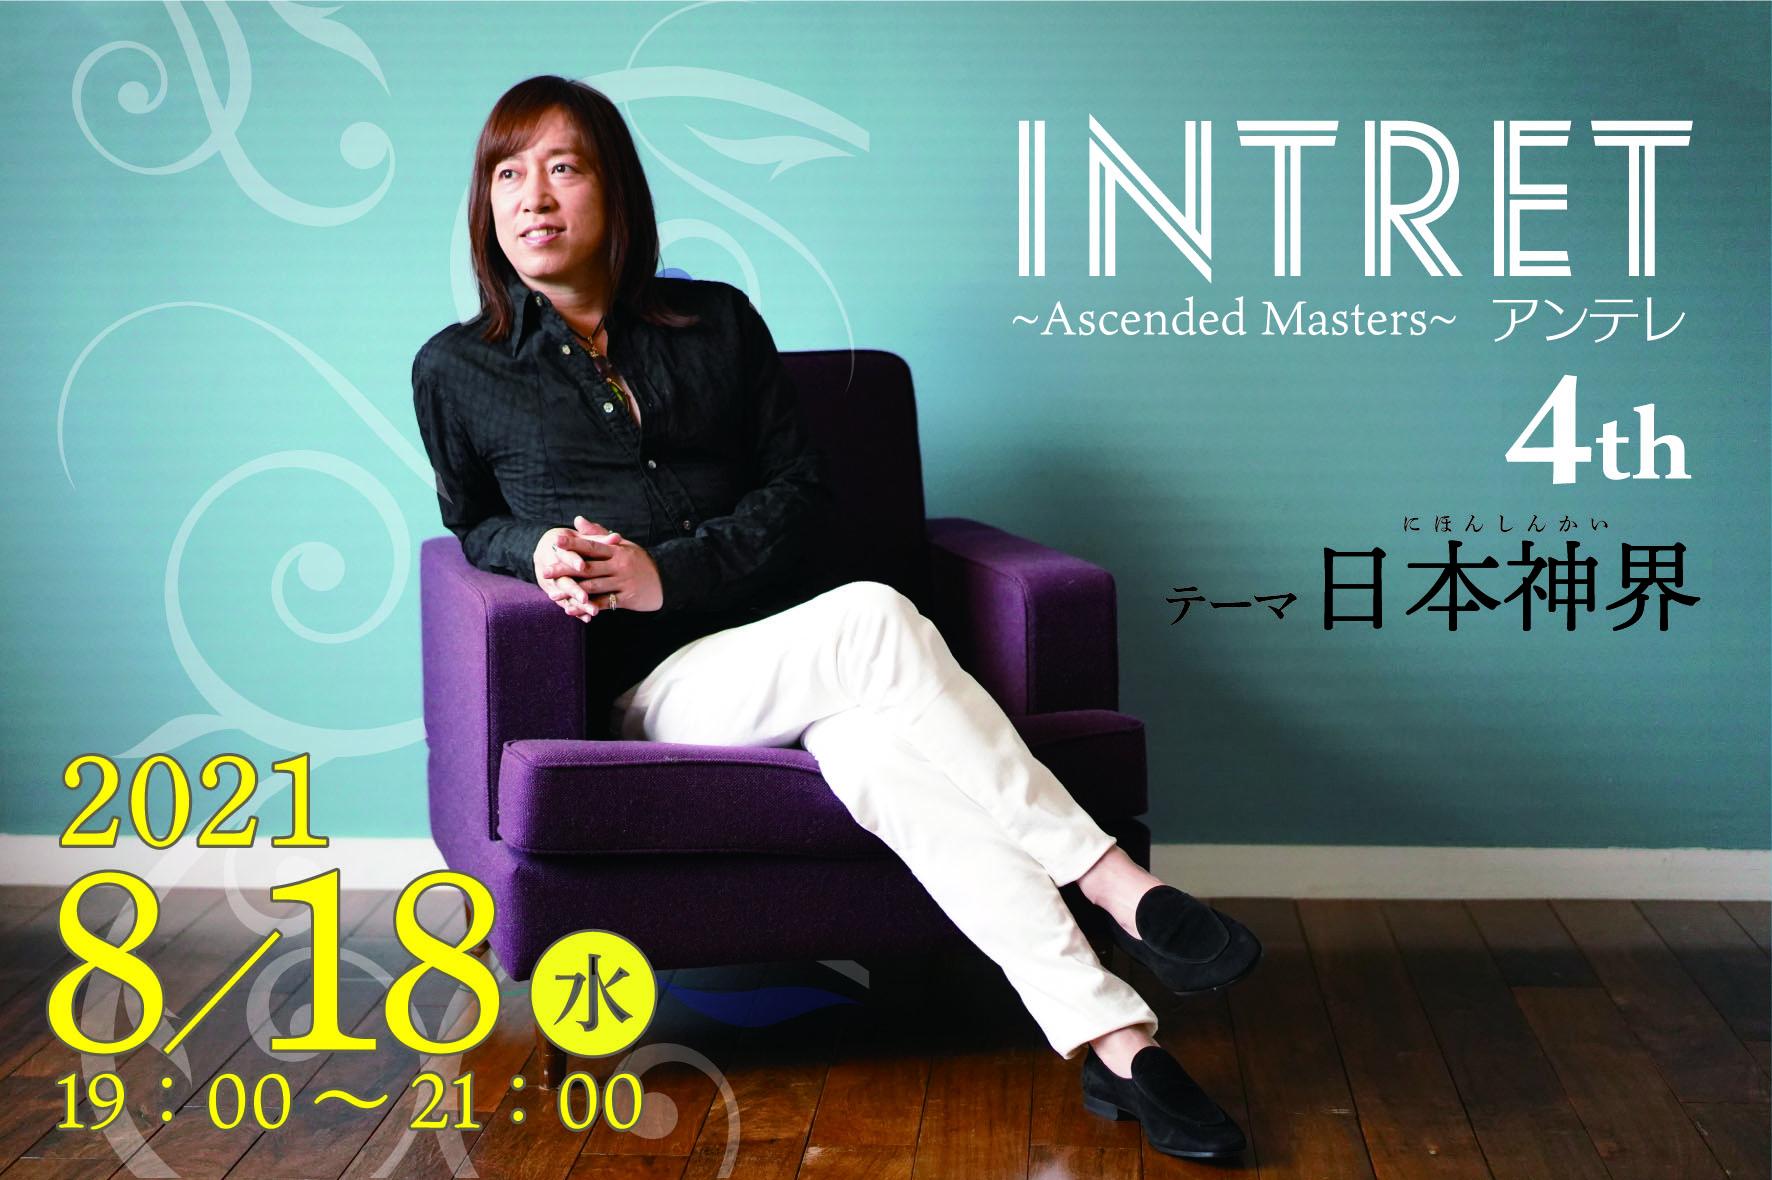 ★【INTRET(アンテレ ):日本神界の真実とは~私たちの意識の進化について学ぶ】